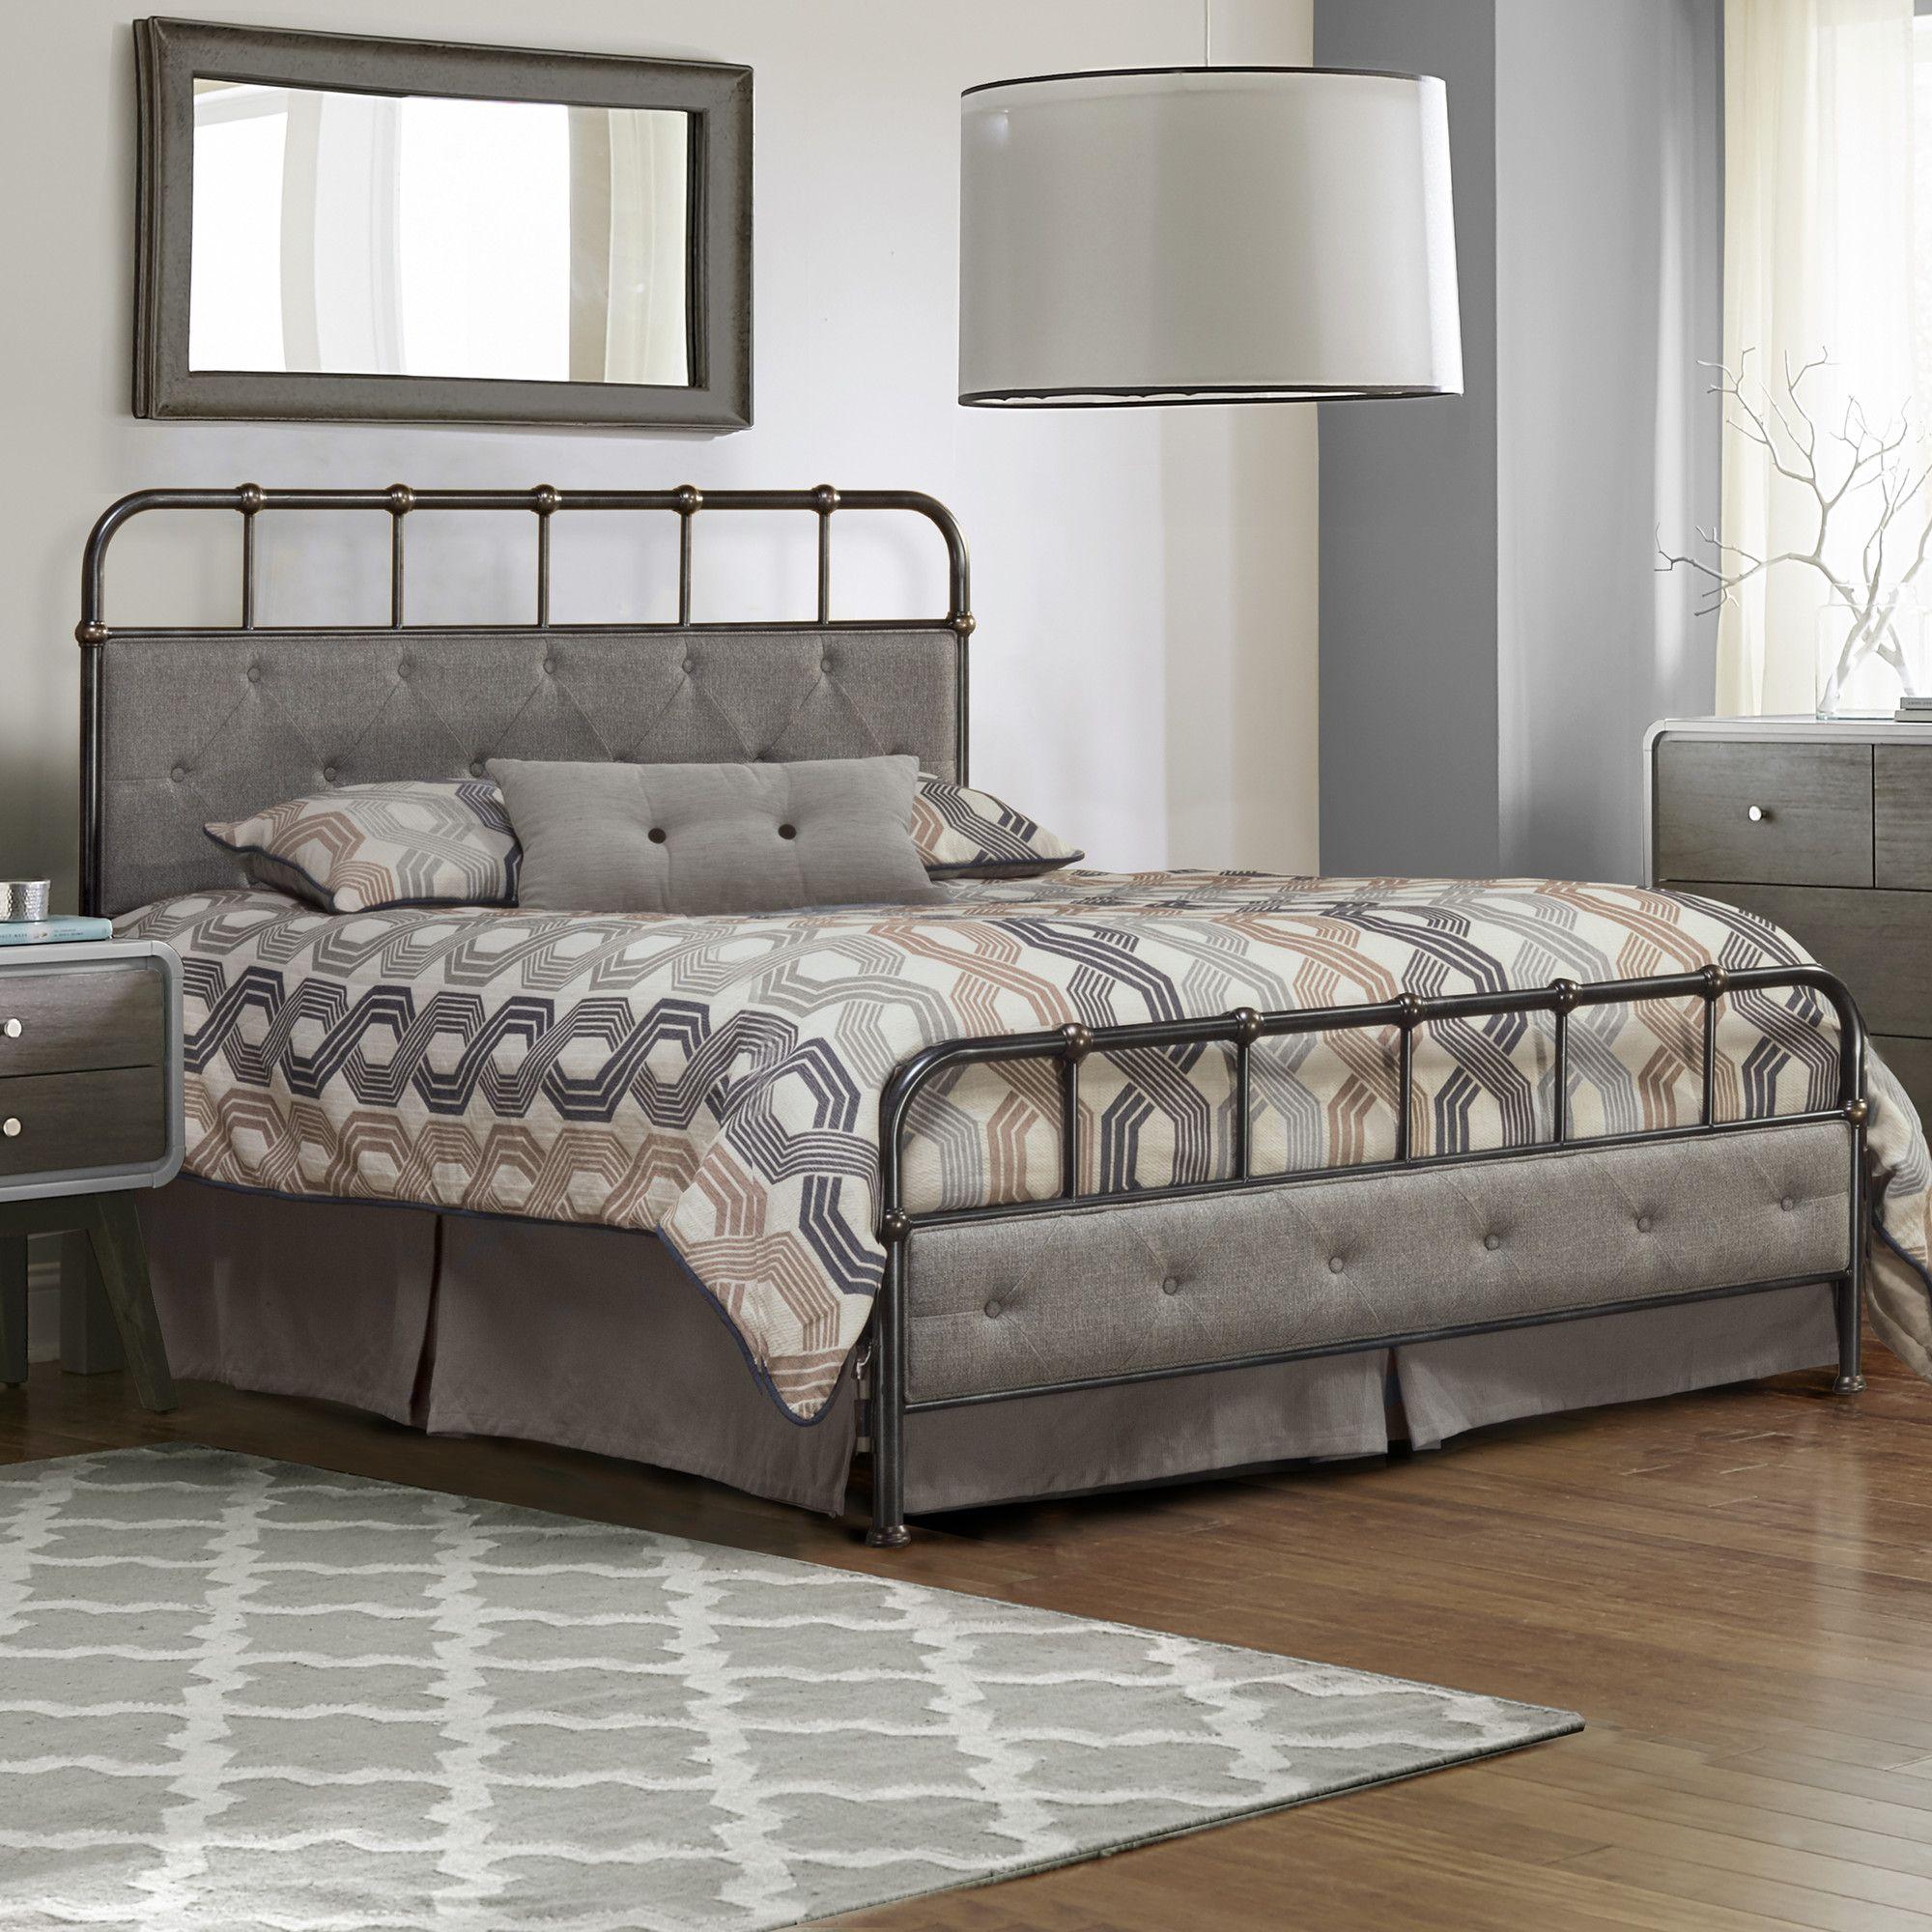 Argens Upholstered Panel Bed Upholstered panel bed, Bed